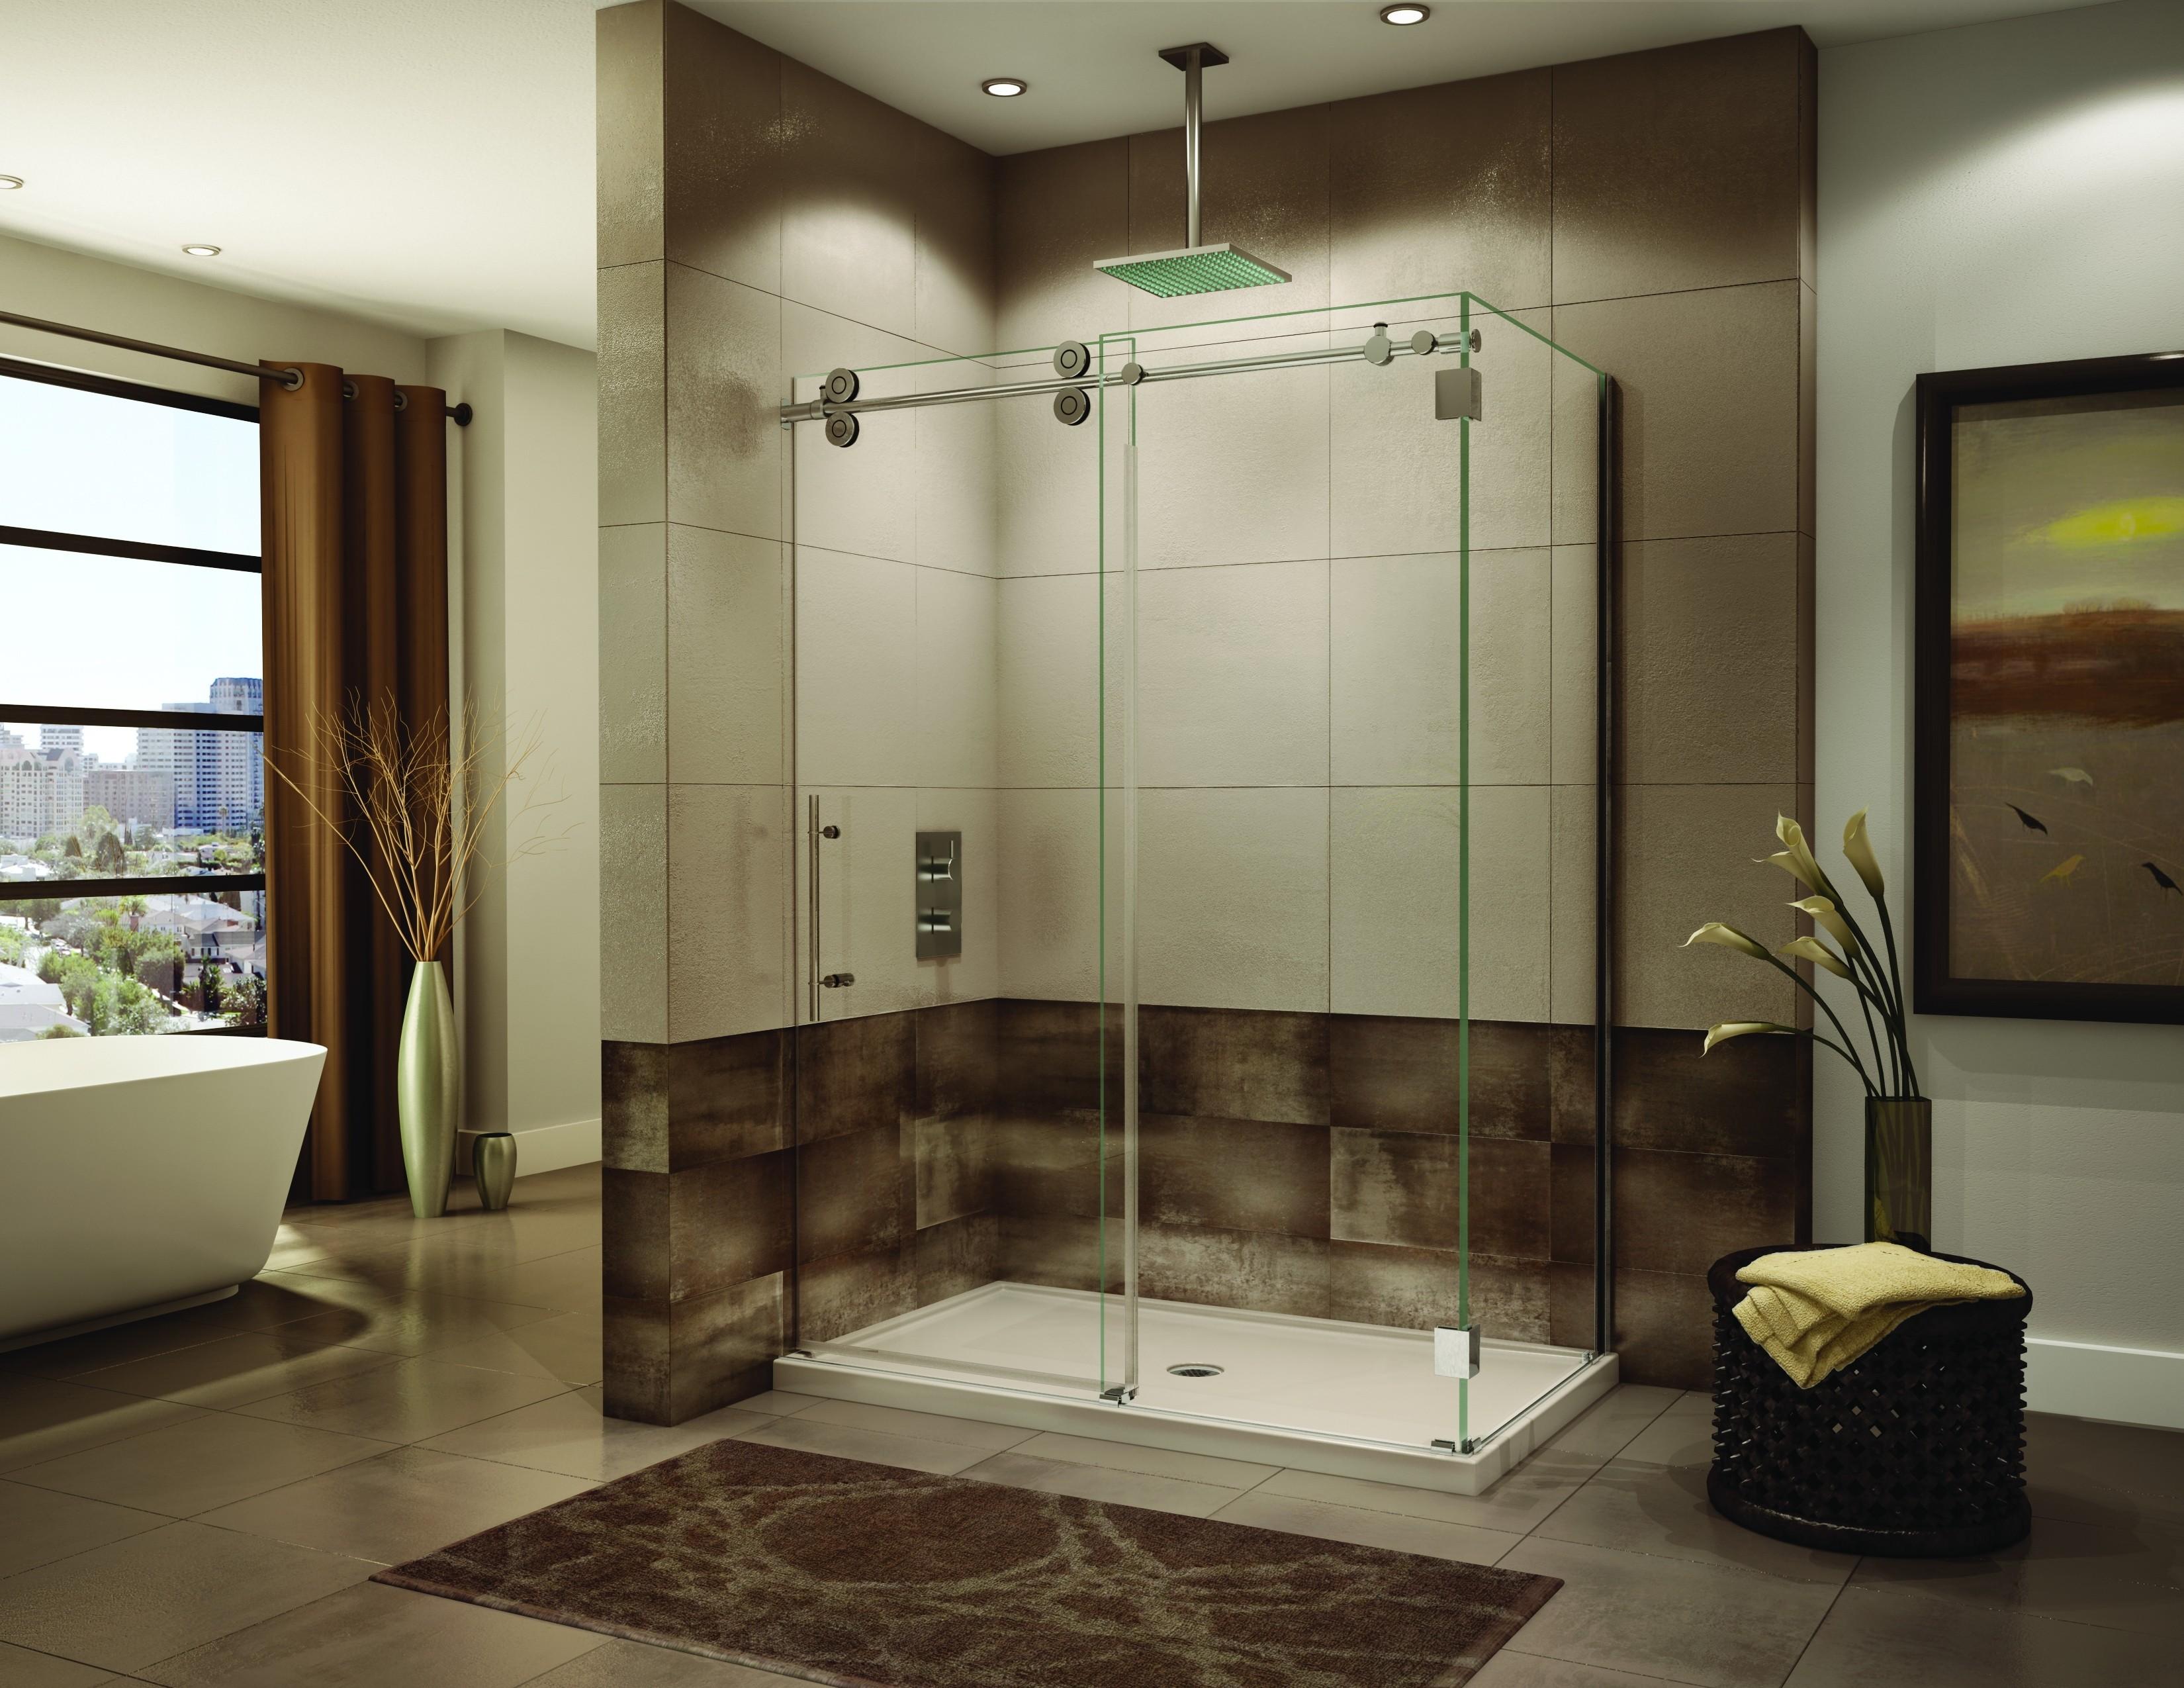 Raleigh Bathroom Remodeling Featuring Frameless Serenity Sliding